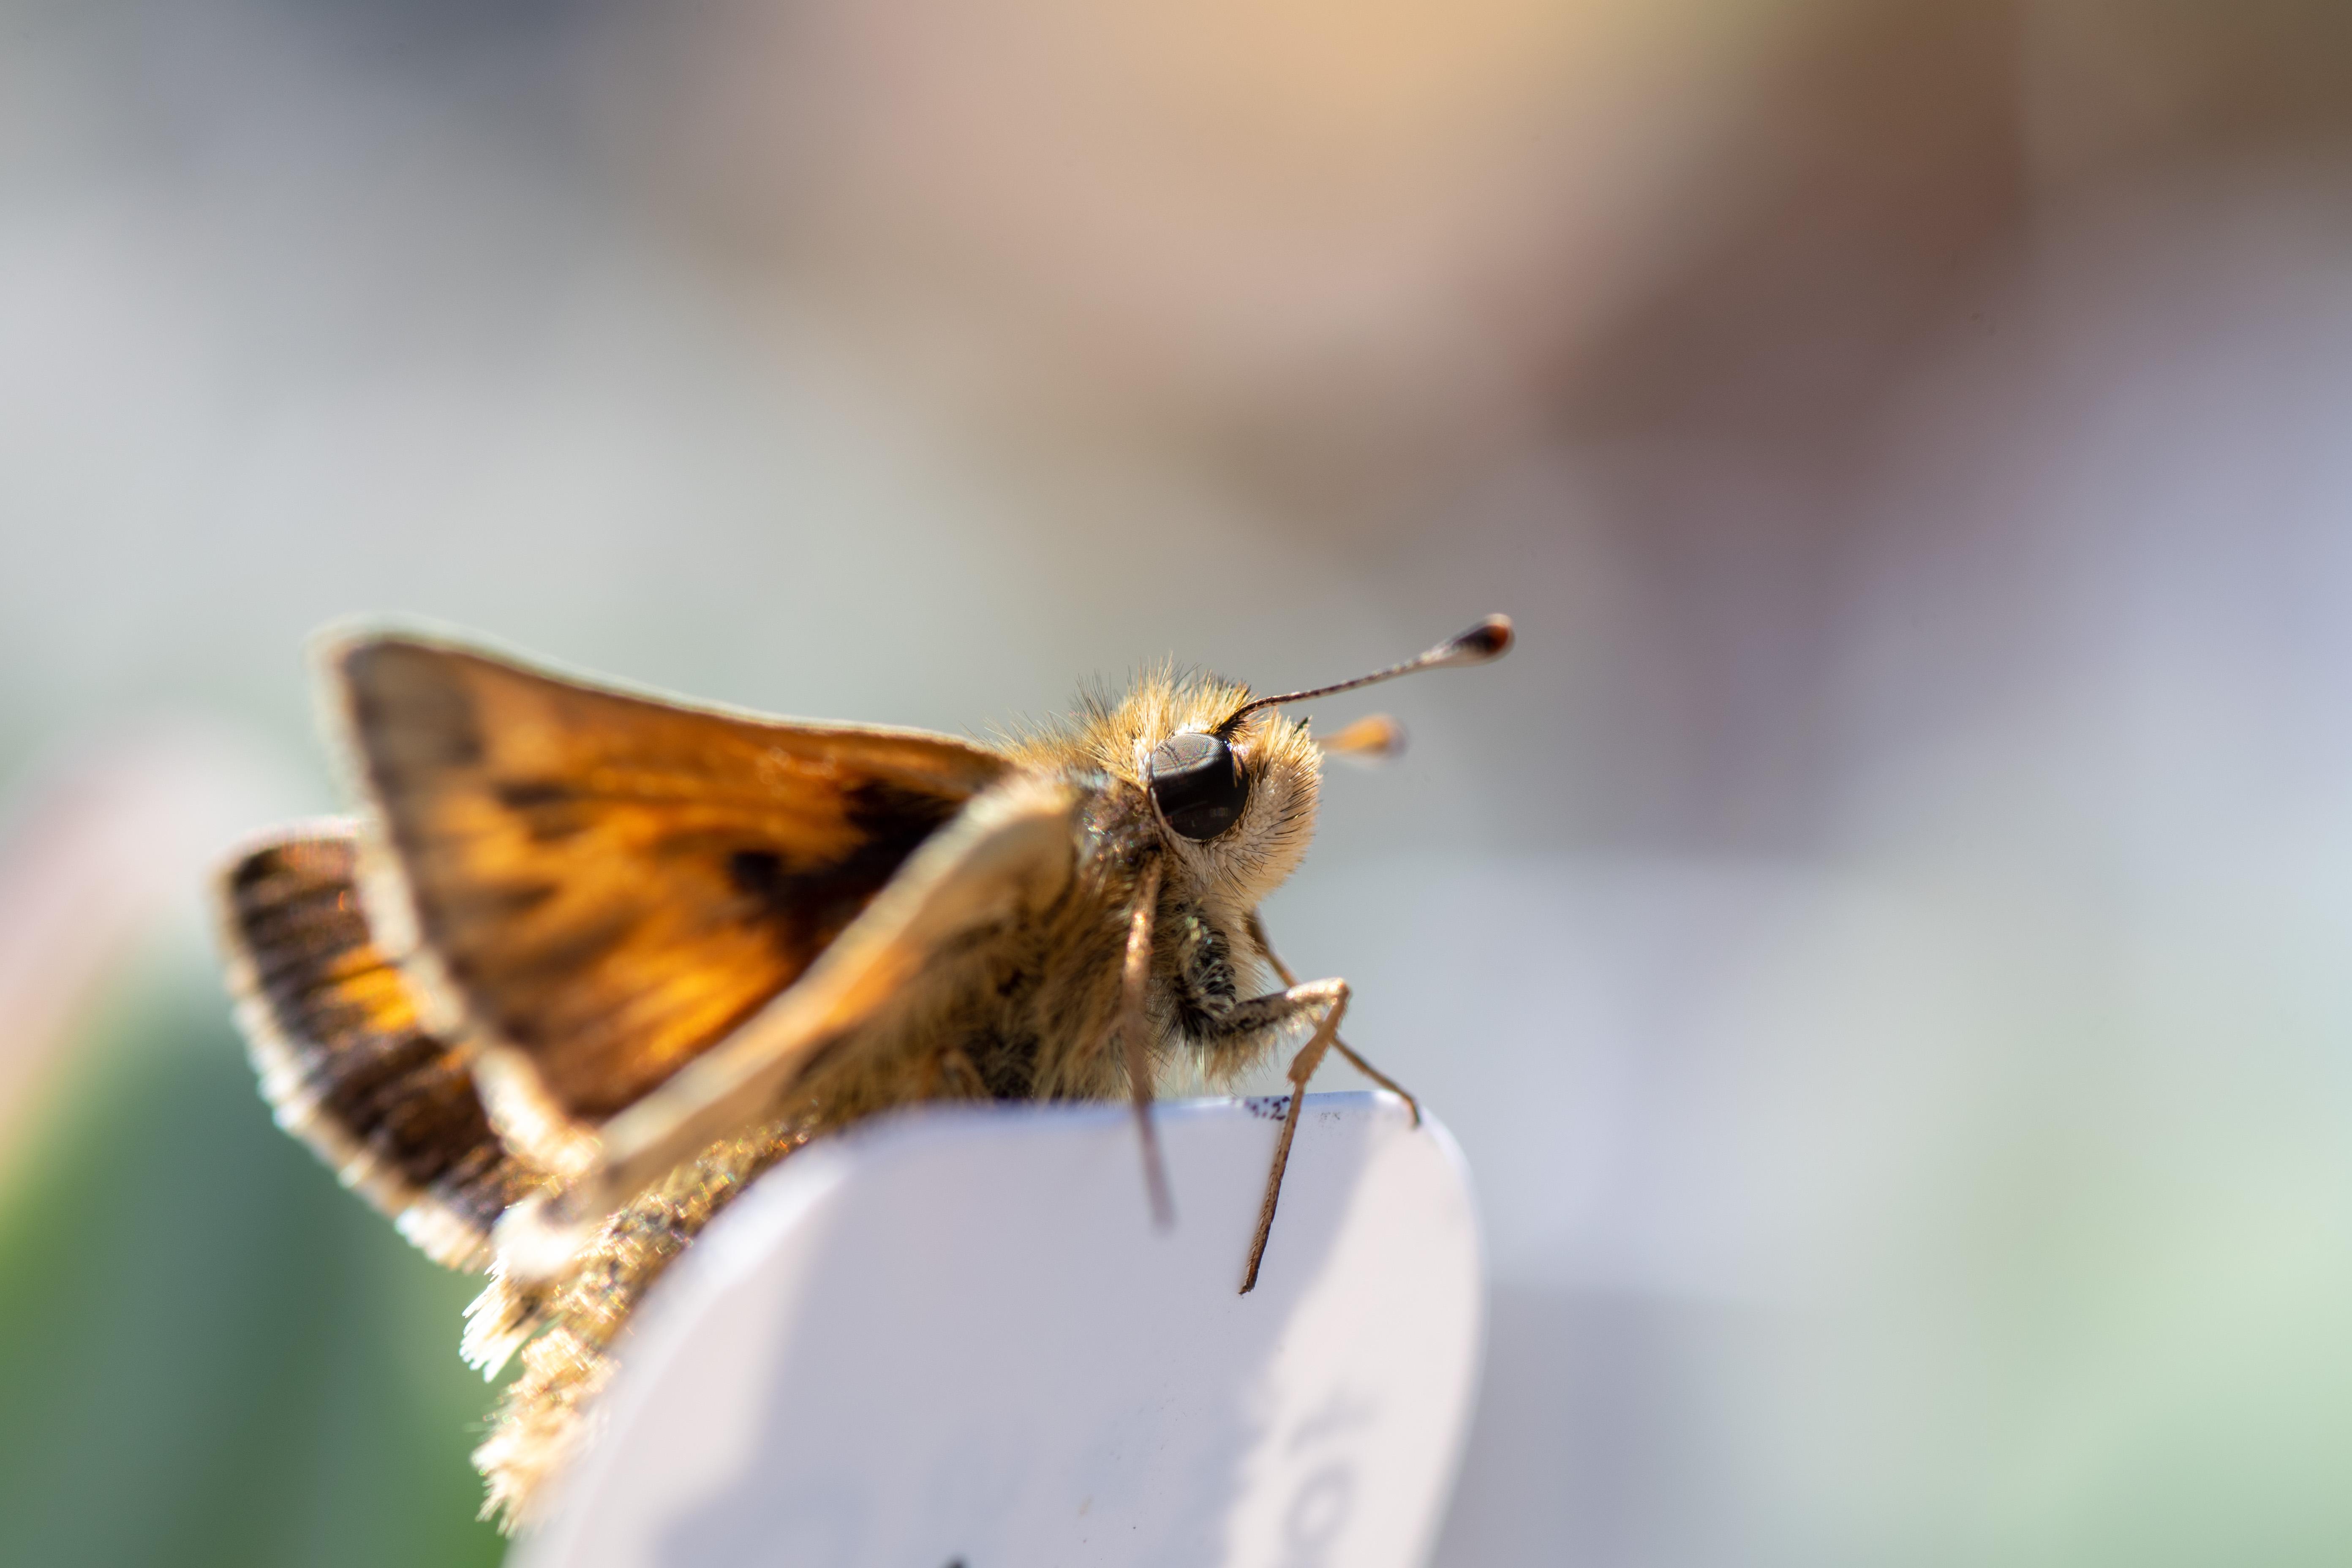 A close up a moth sitting in the sun